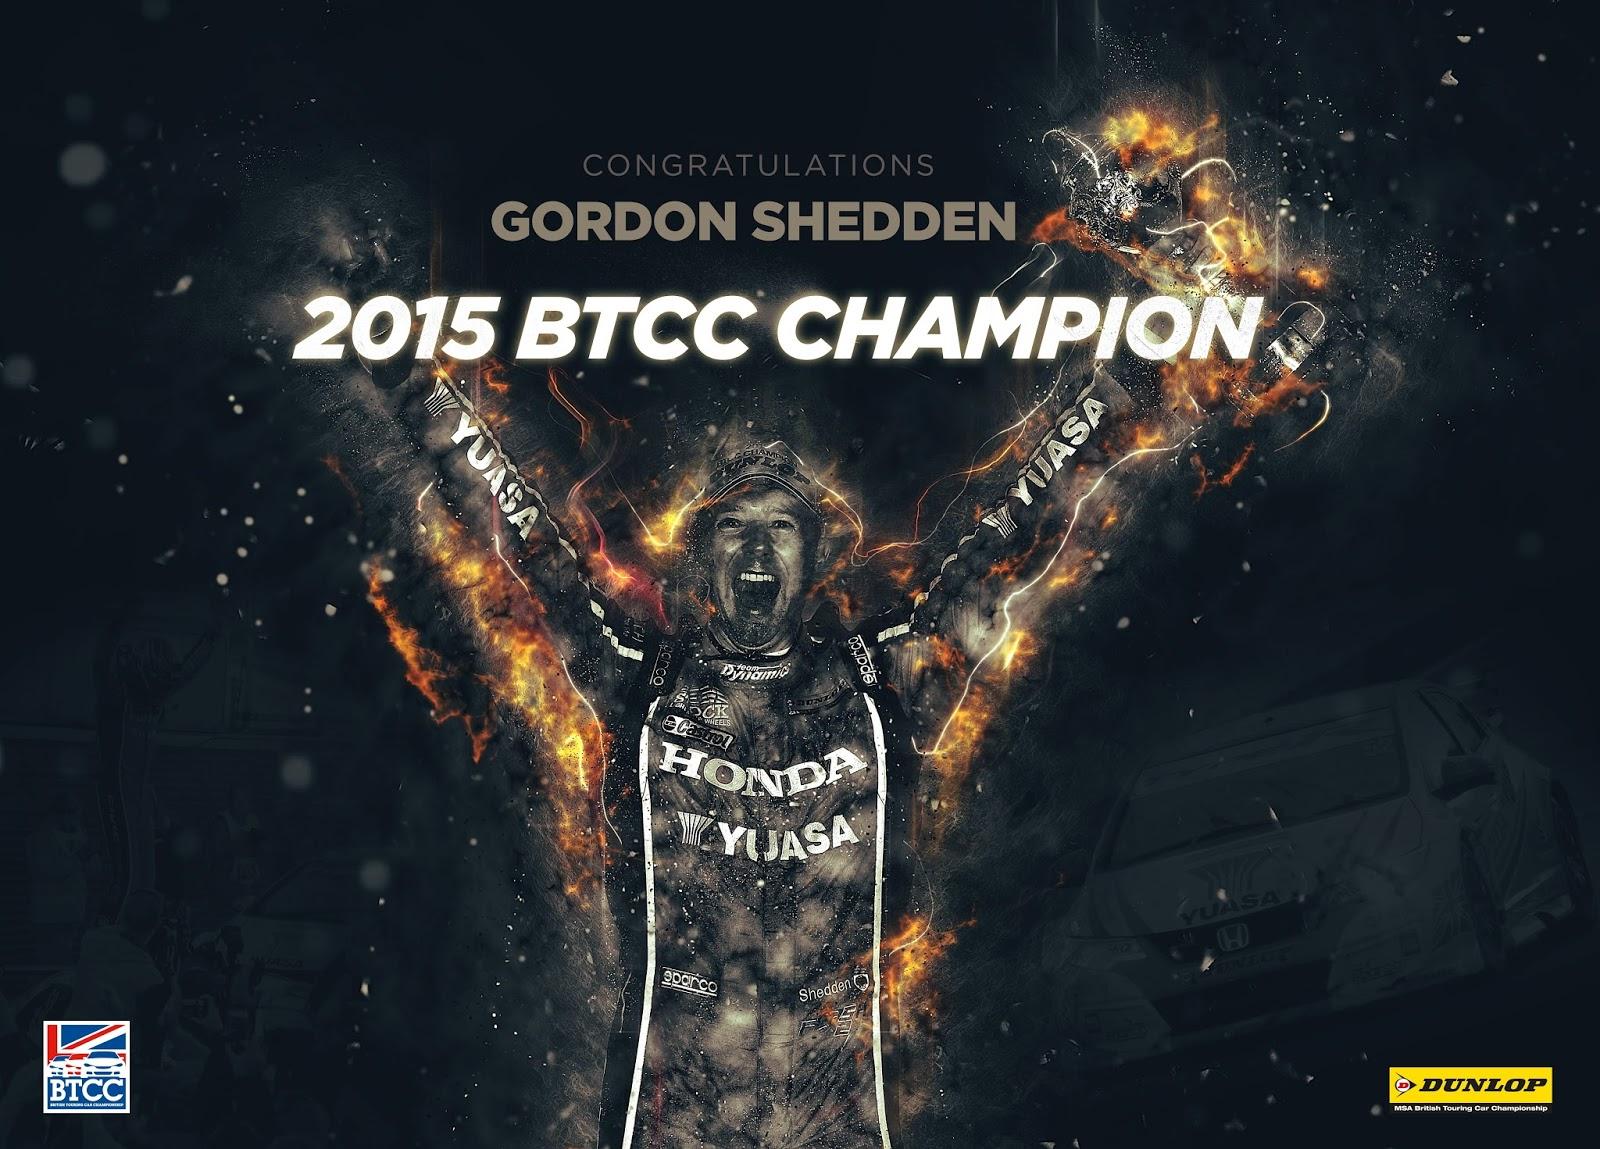 BTCC 2015 Champions Gordon Shedden Η συλλογή τίτλων μόλις ξεκίνησε για το νέο Civic Type R BTCC, Hatcback, Honda, Honda Civic, Honda Civic Type R, Rally, videos